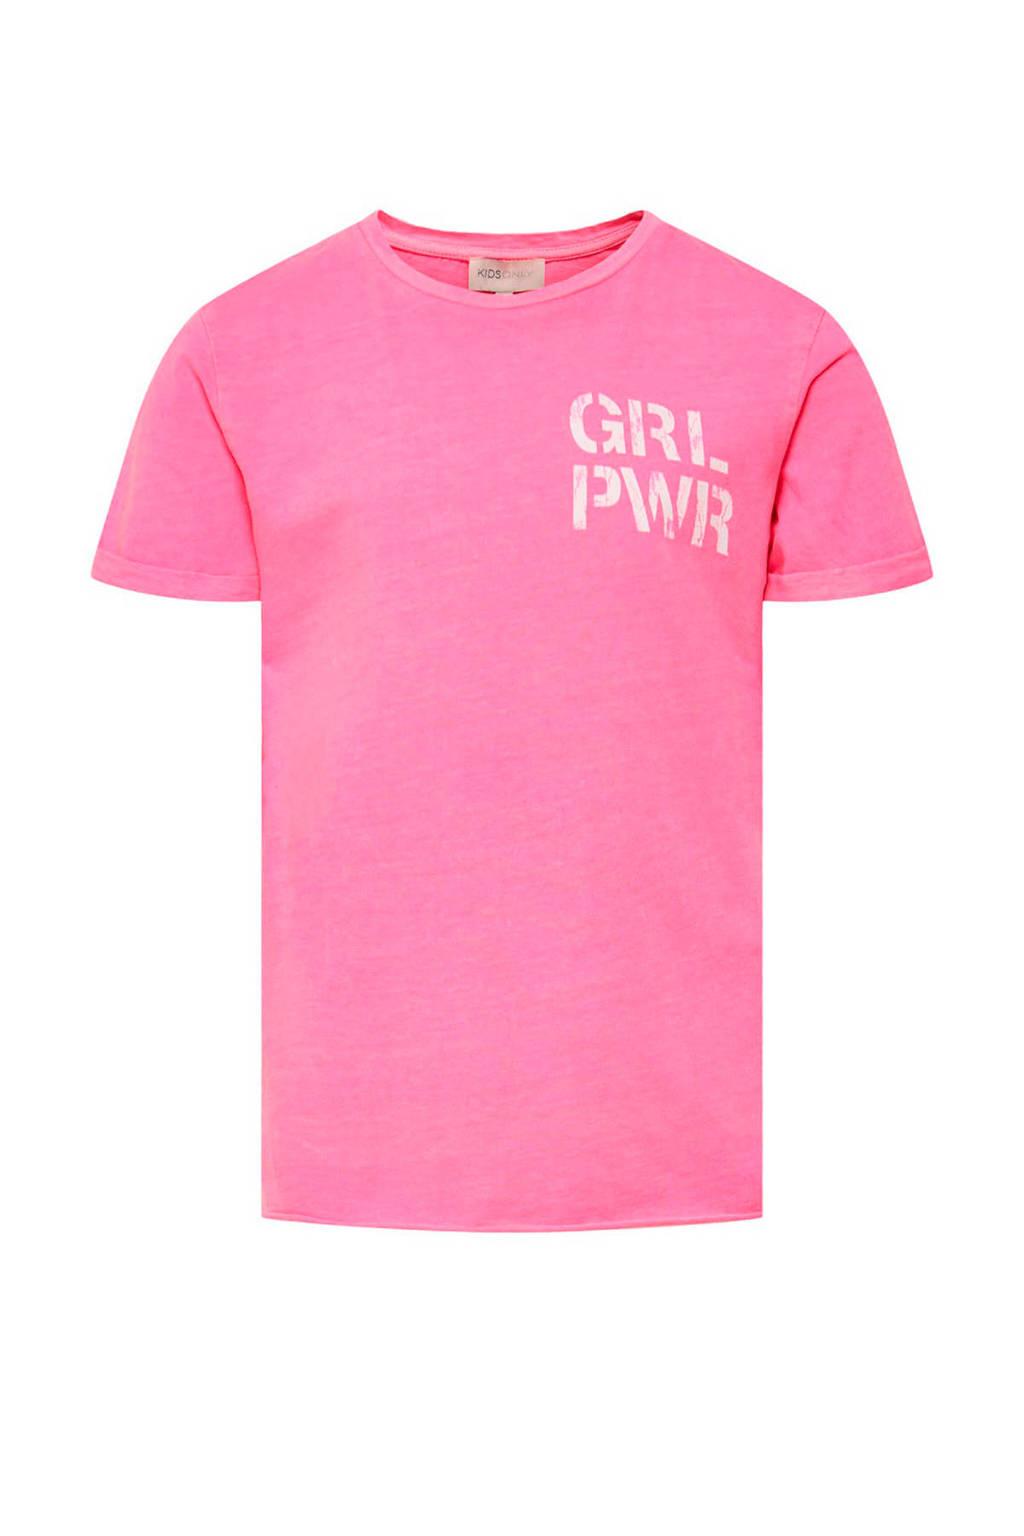 KIDS ONLY T-shirt Nacid met tekst roze/wit, Roze/wit